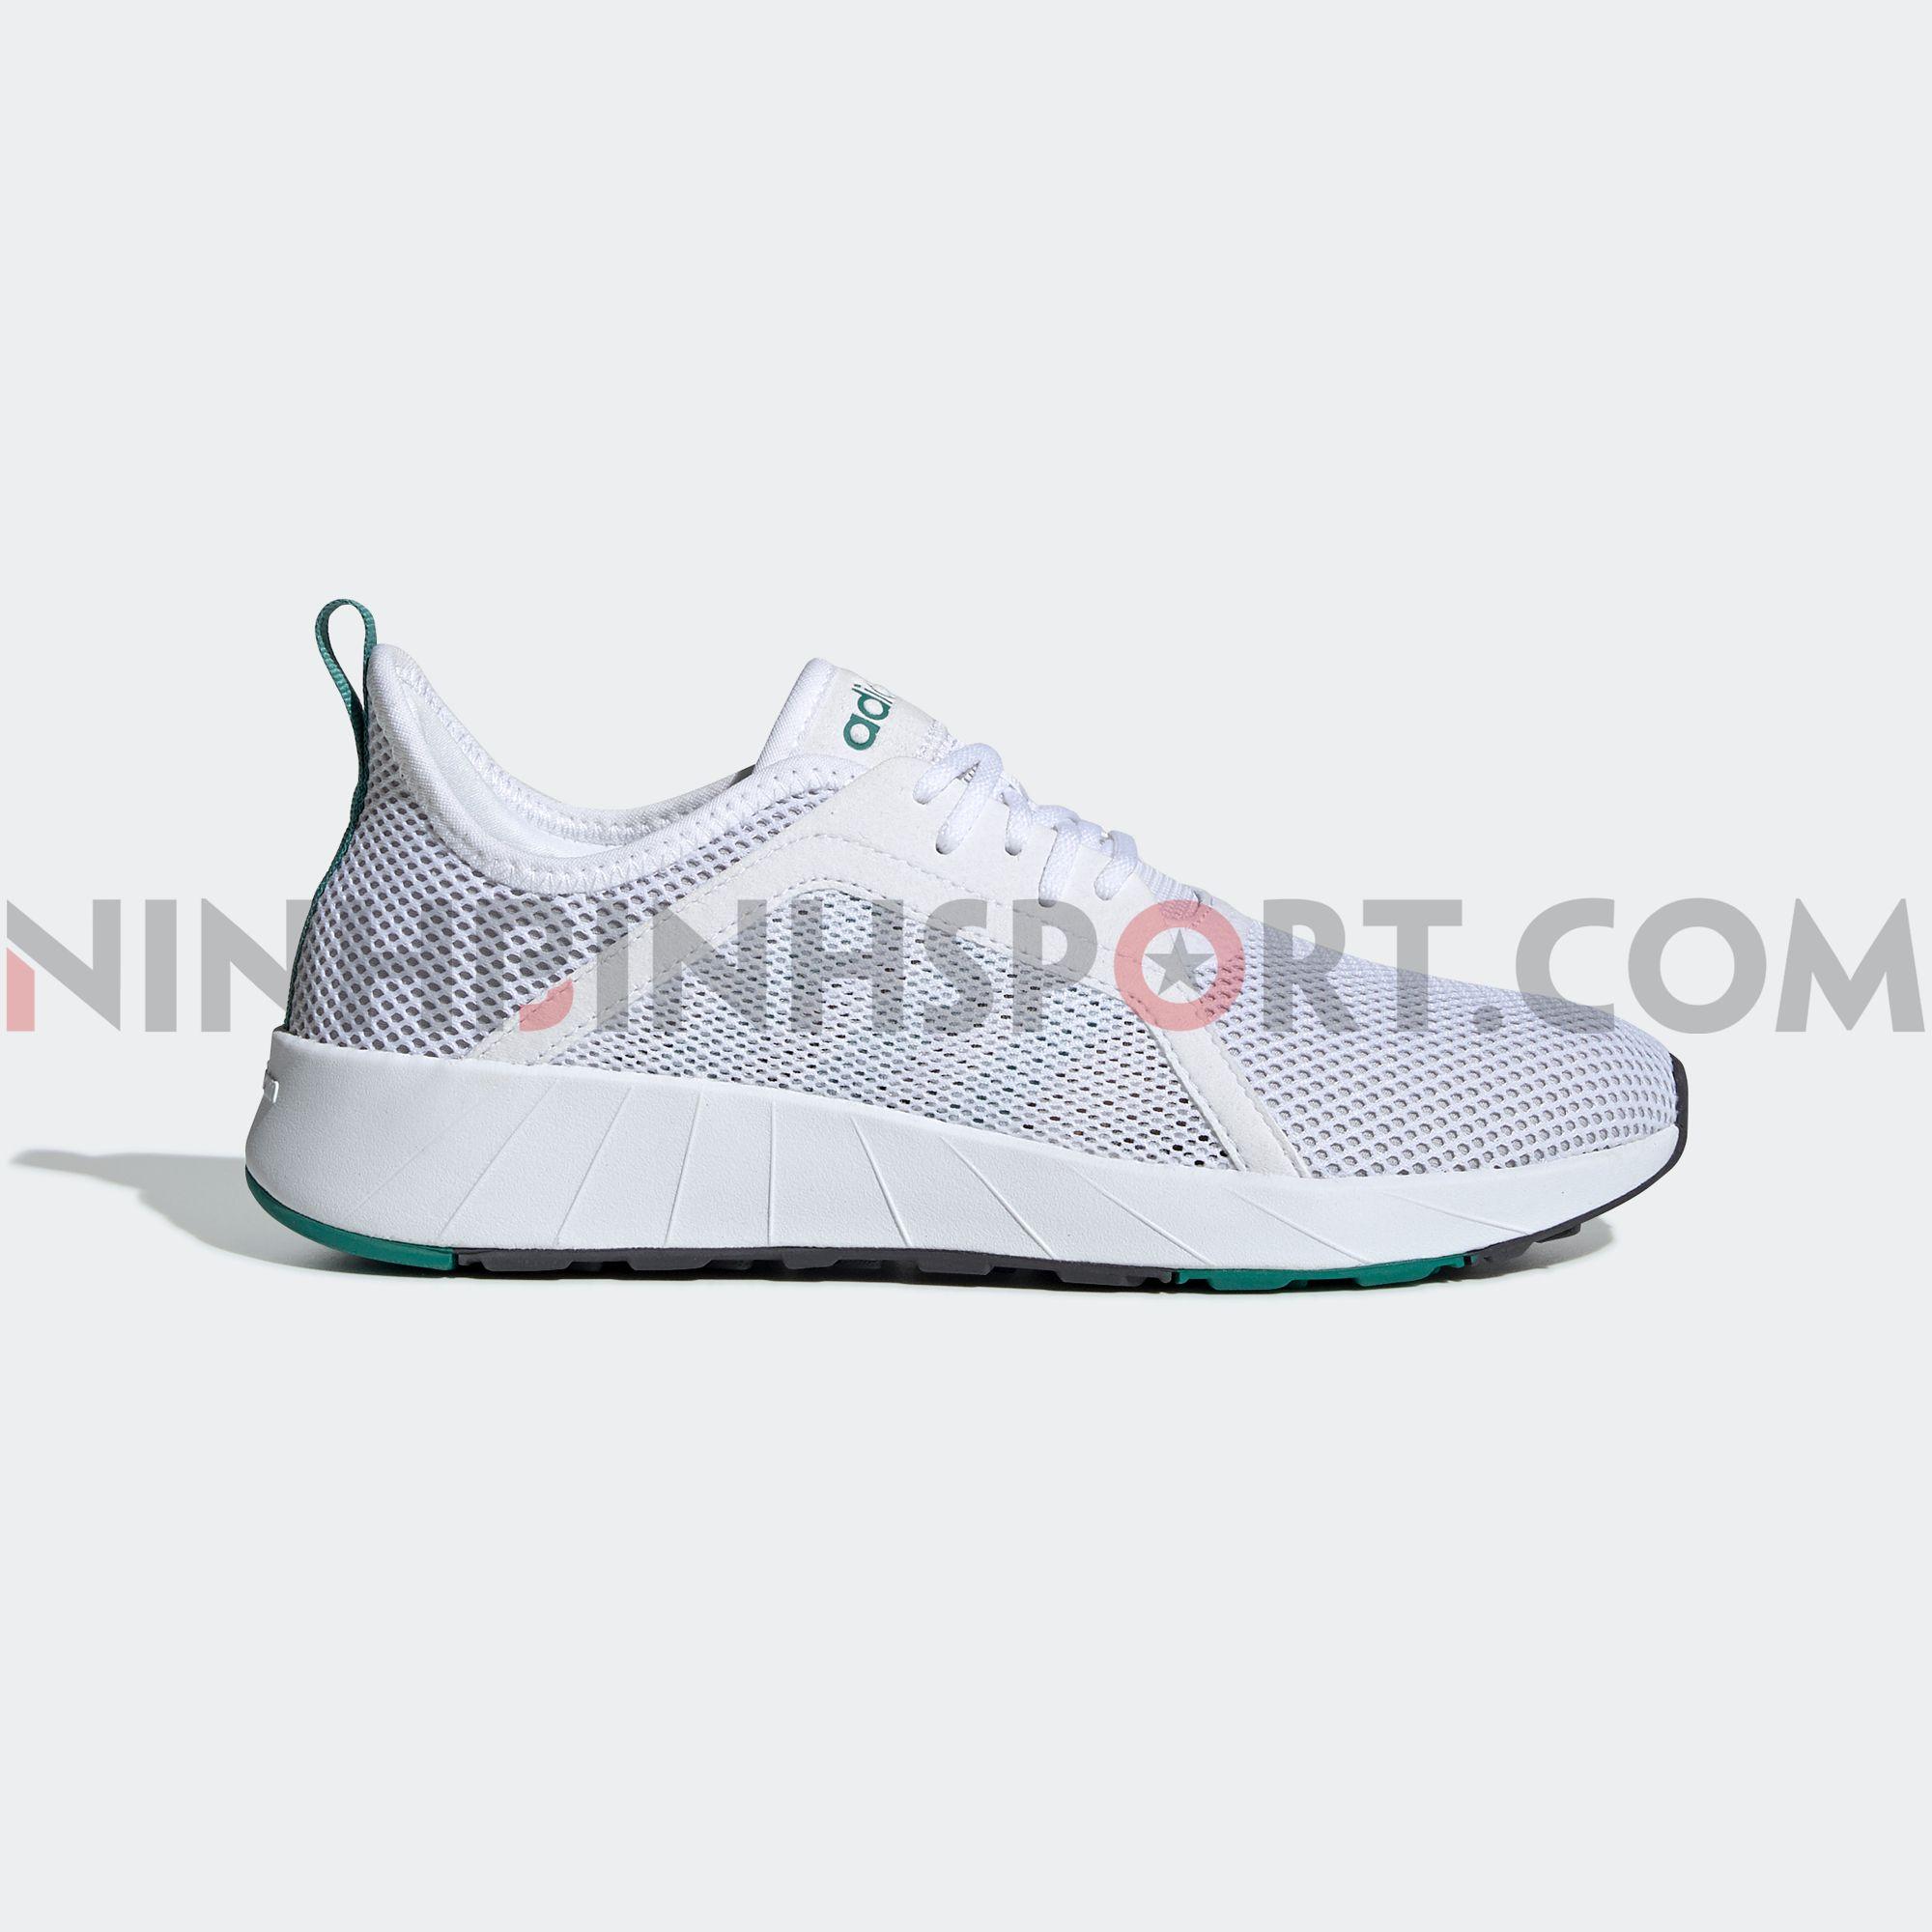 Giầy thể thao nữ Adidas Neo Khoe Run White - F36792